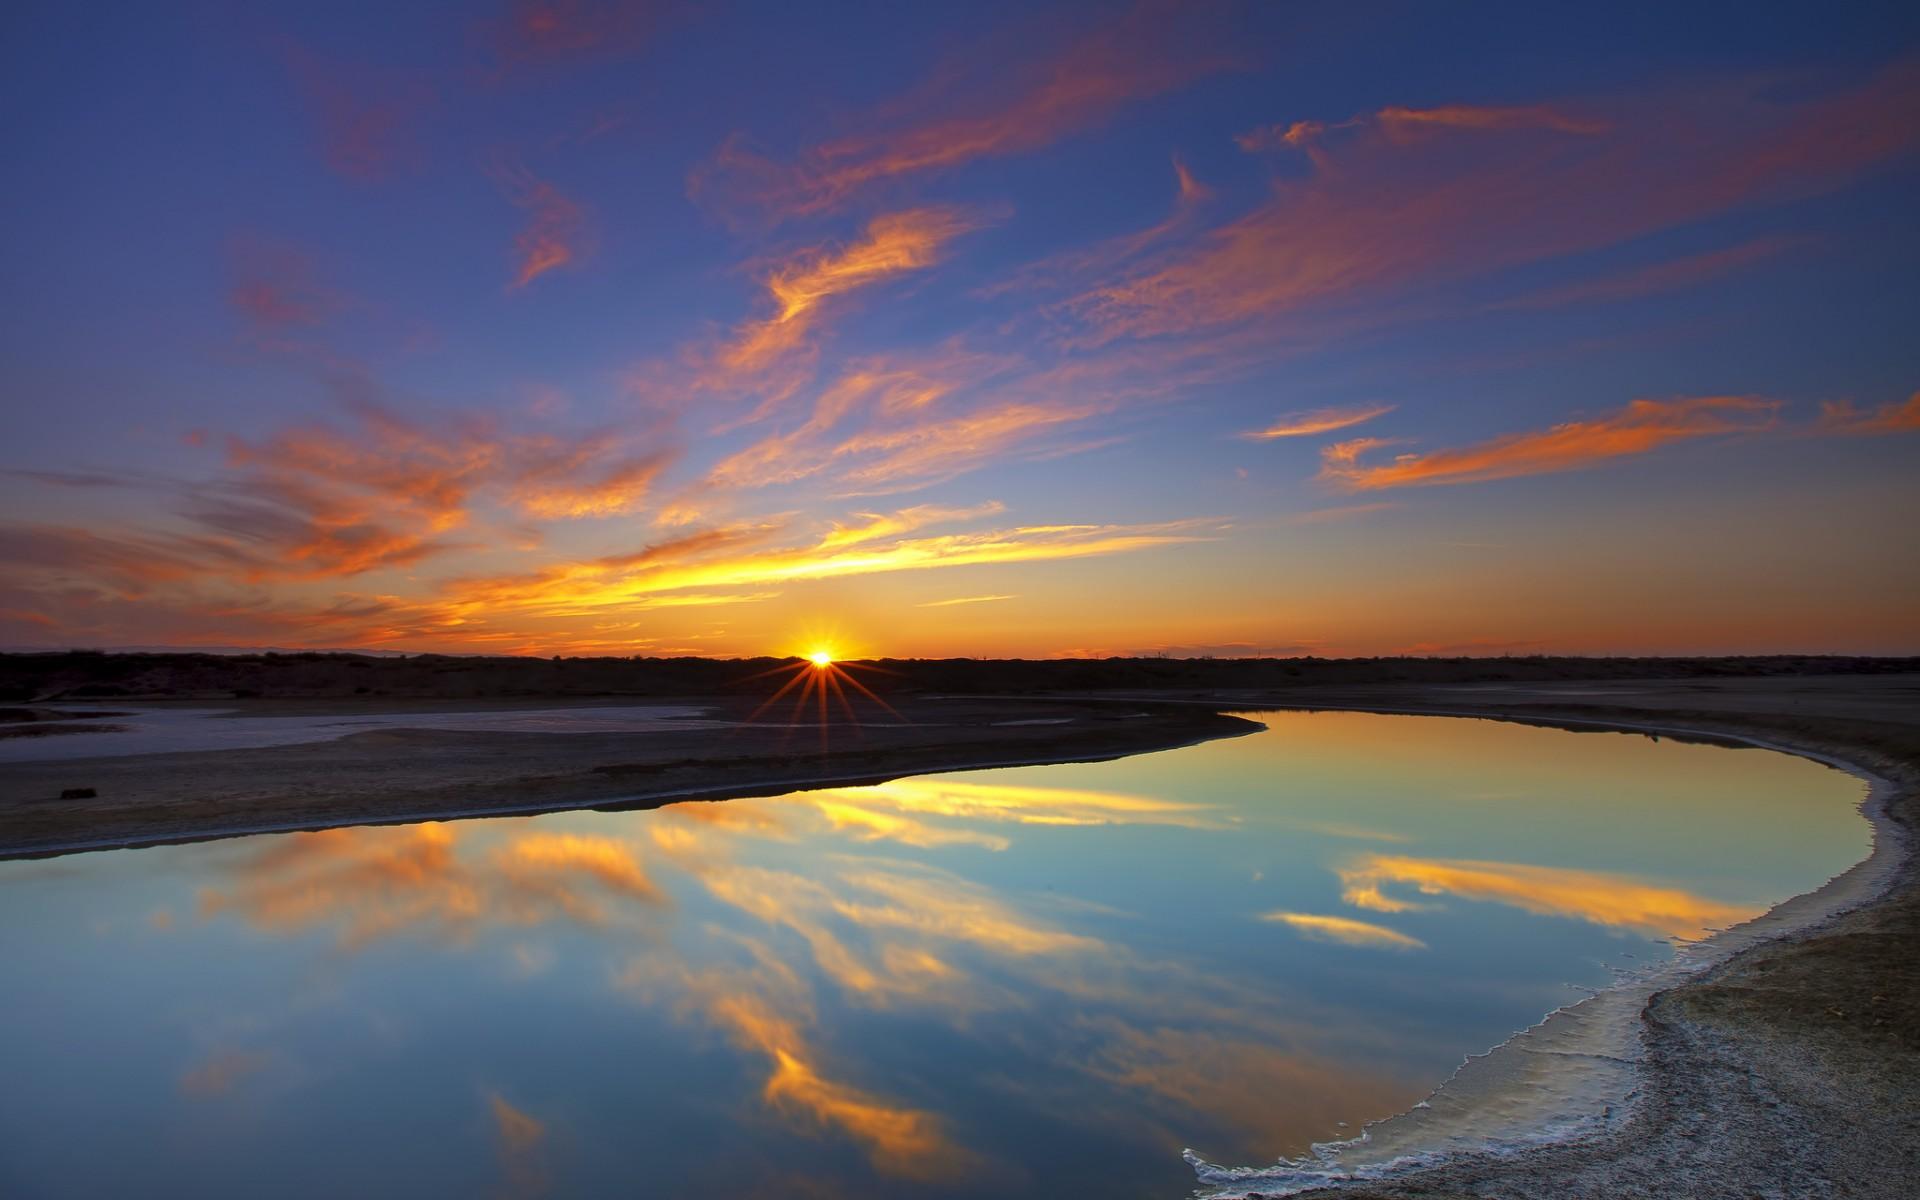 Wallpaper sunlight landscape sunset sea night abstract lake